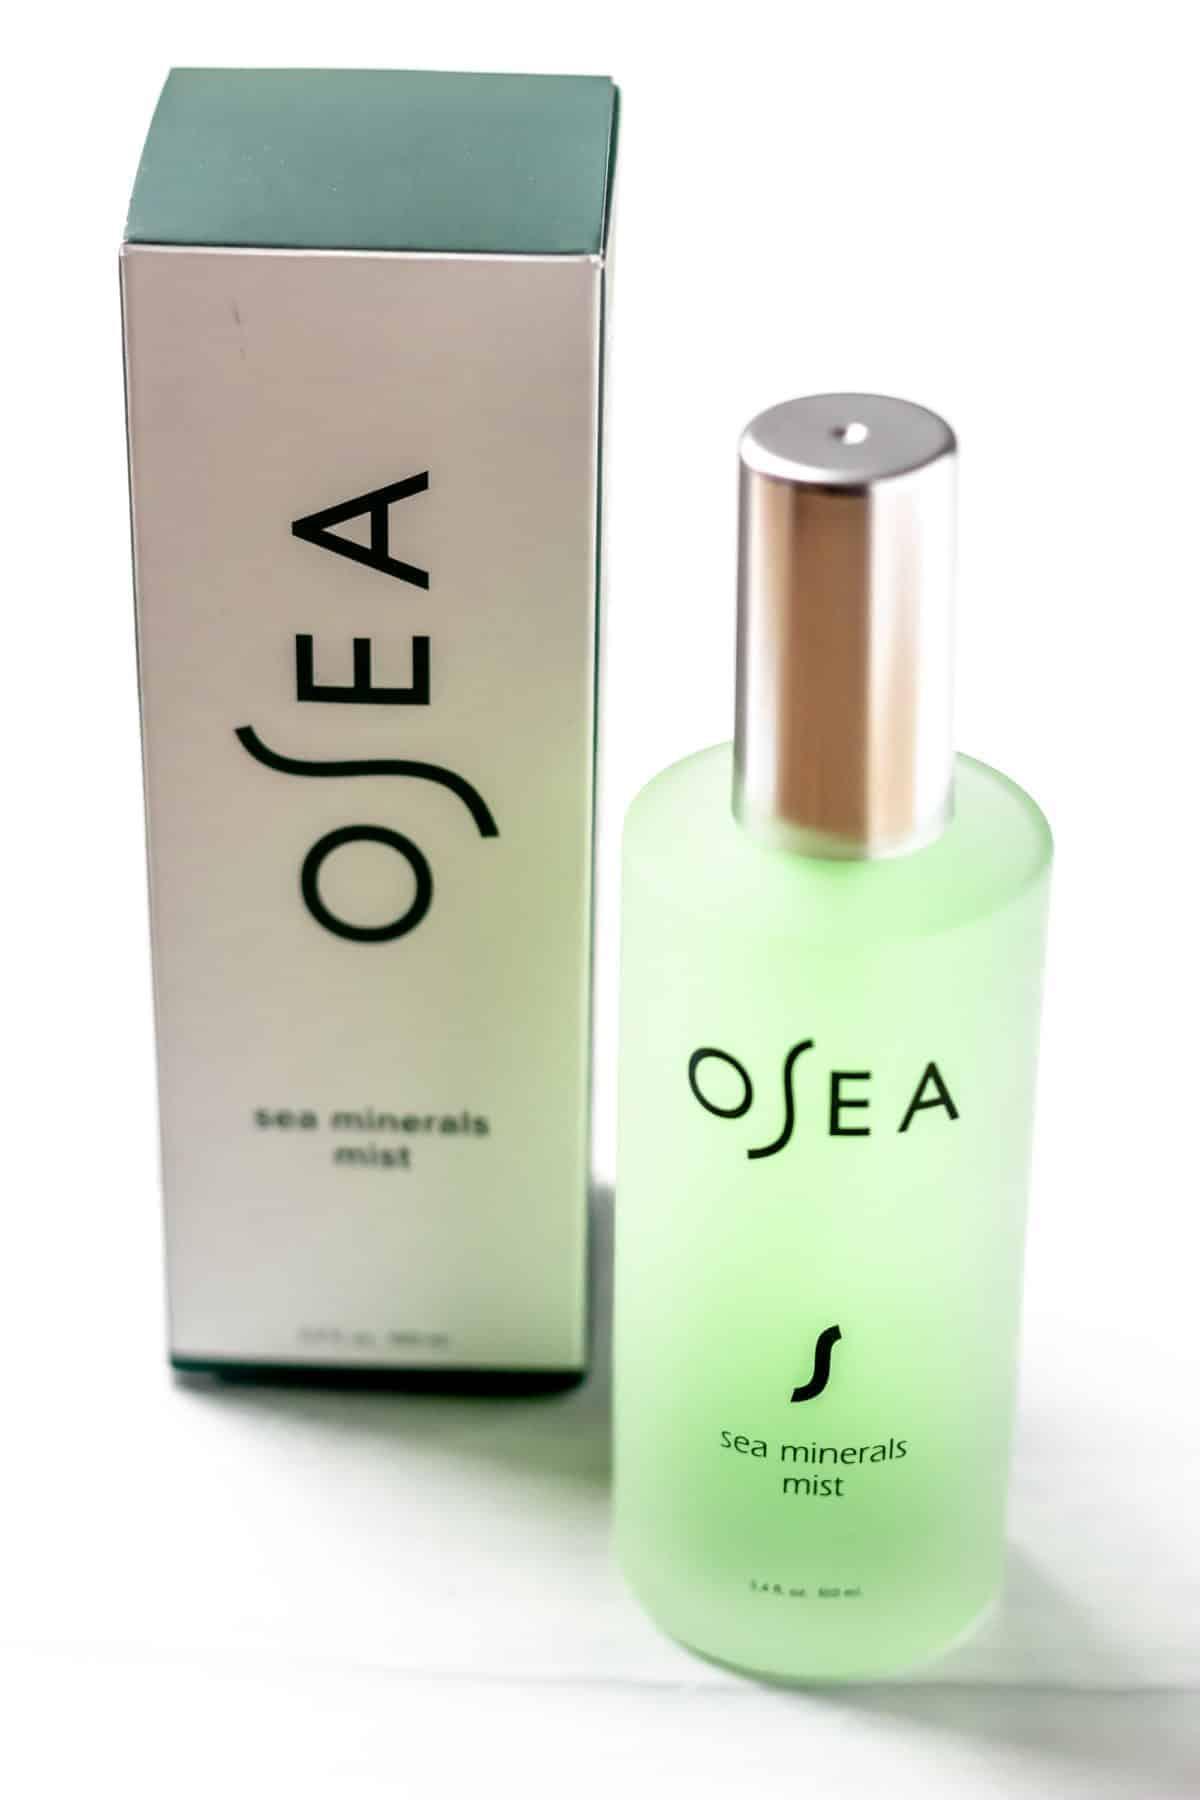 OSEA Malibu Sea Mineral Mist bottle and box on a white background